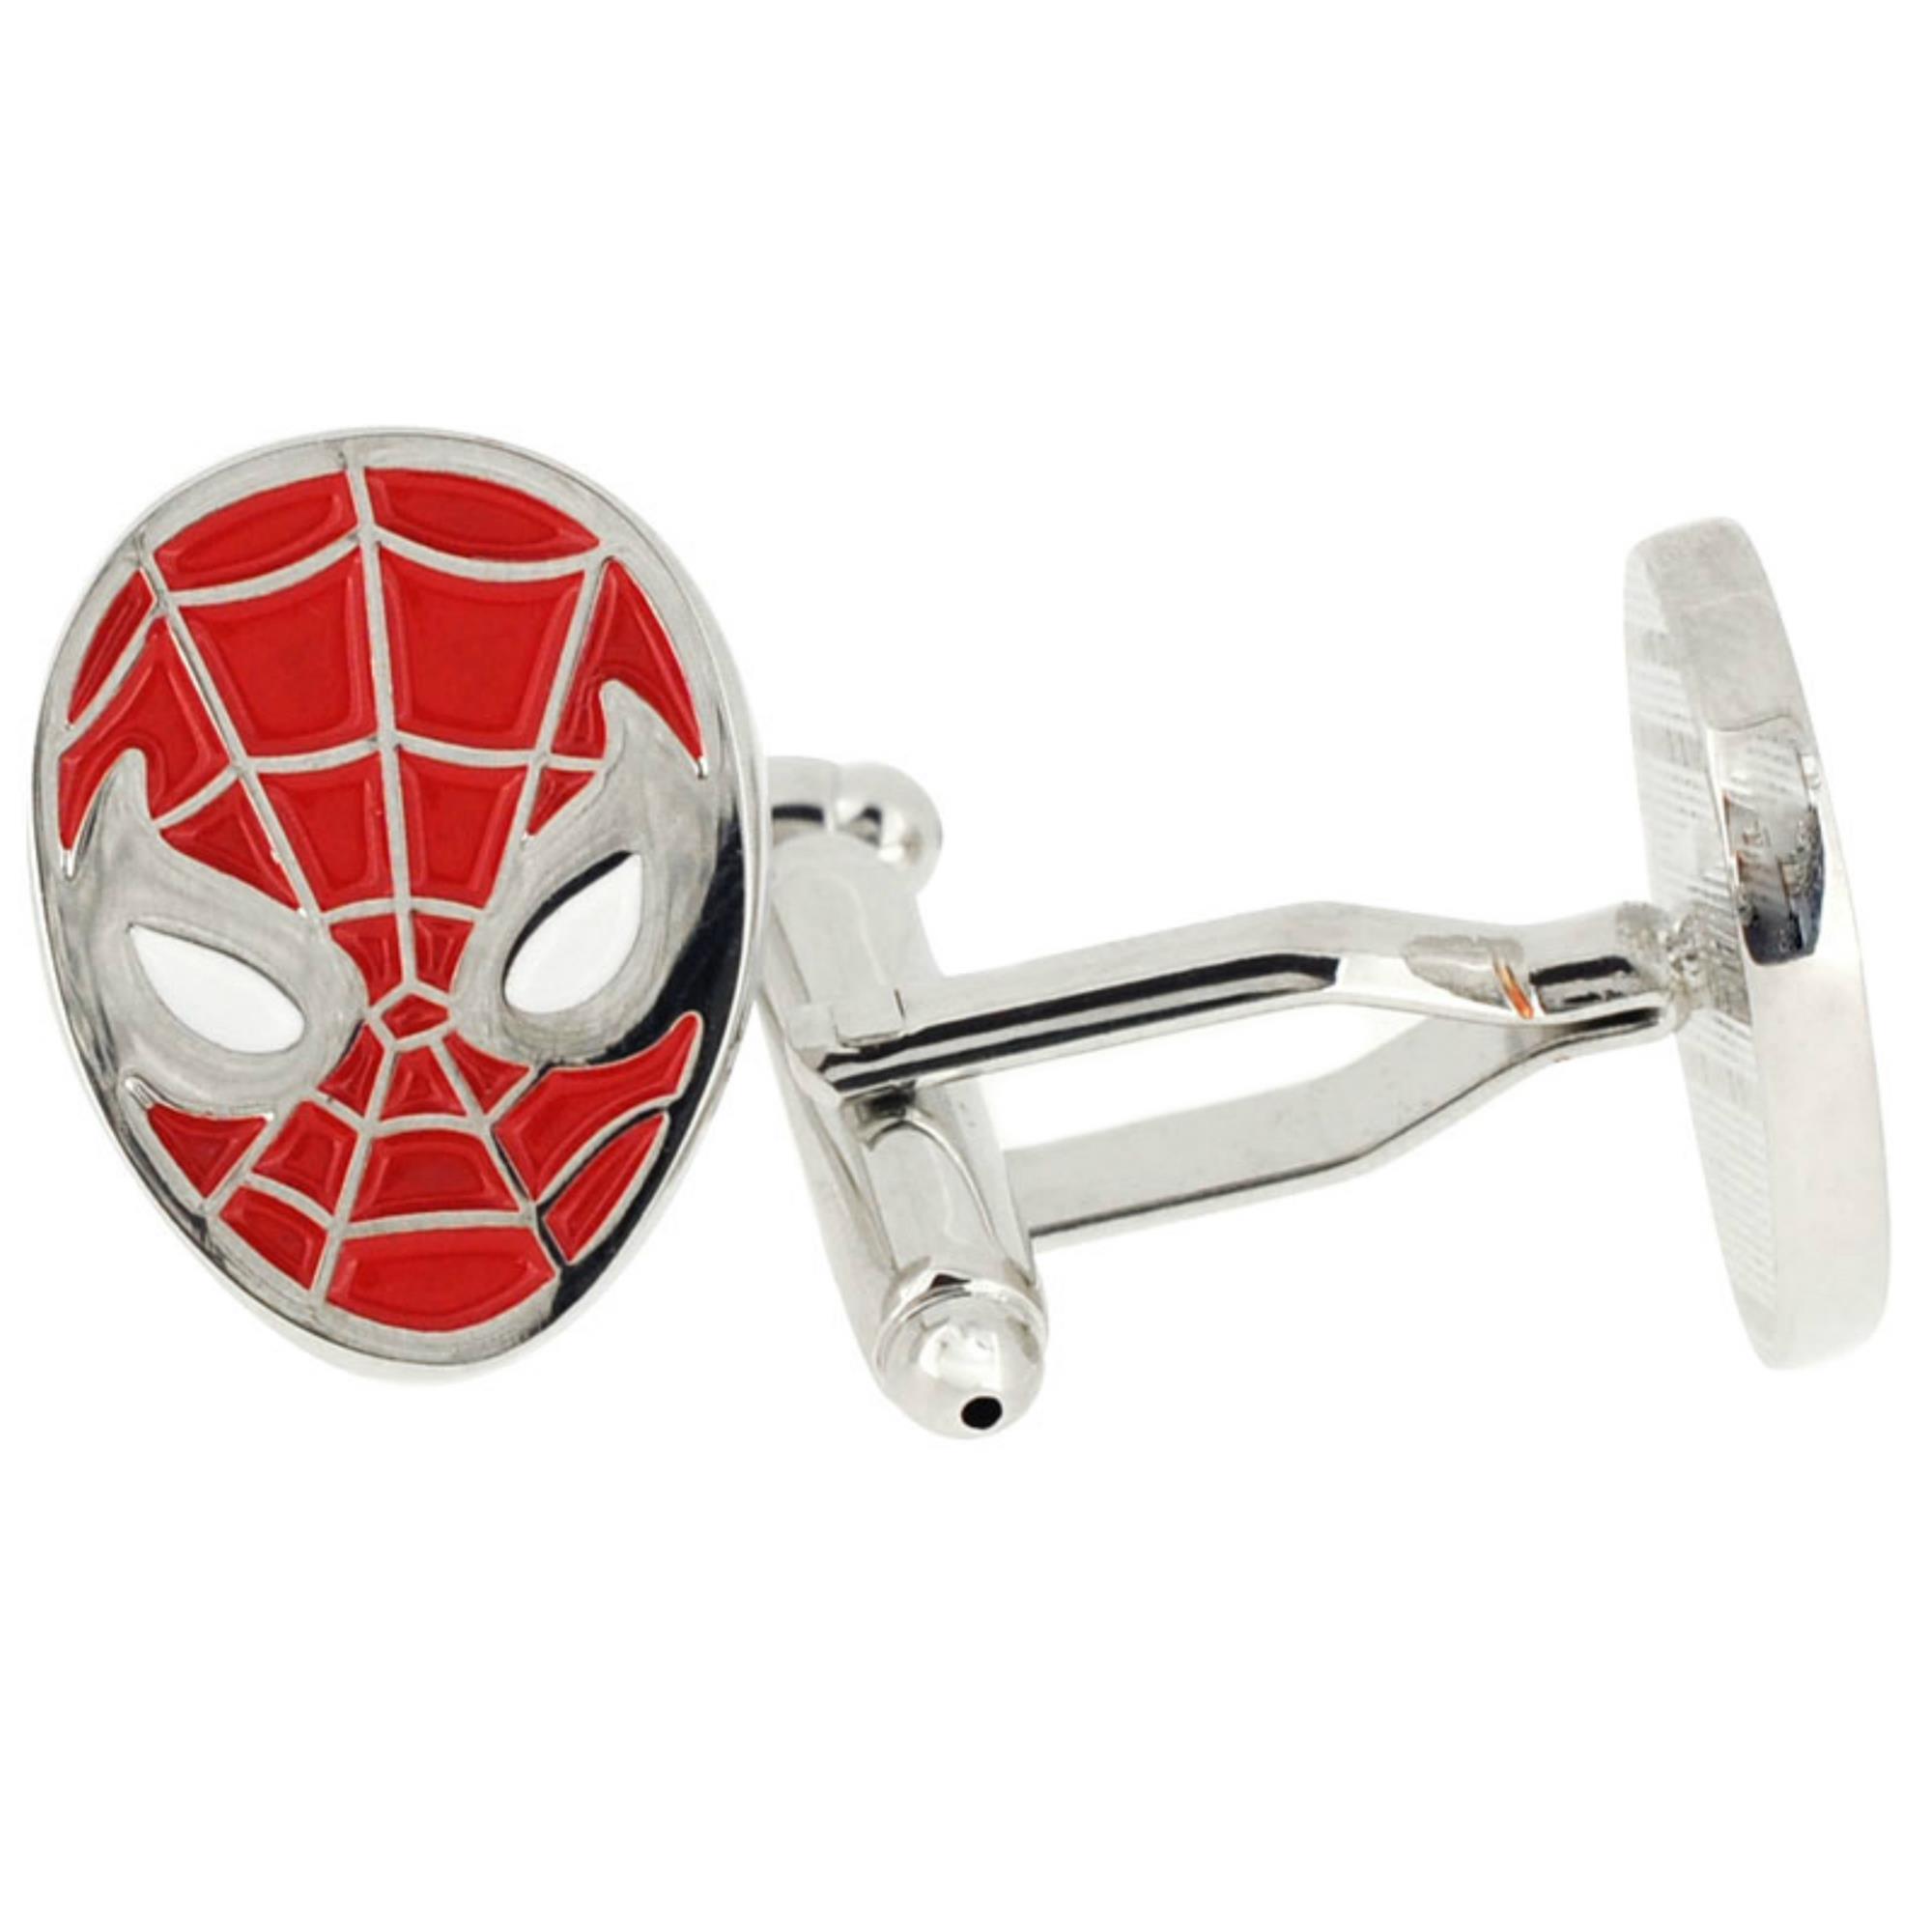 Superheroes Marvel Comics (Captain America) Spiderman Mask Cufflinks